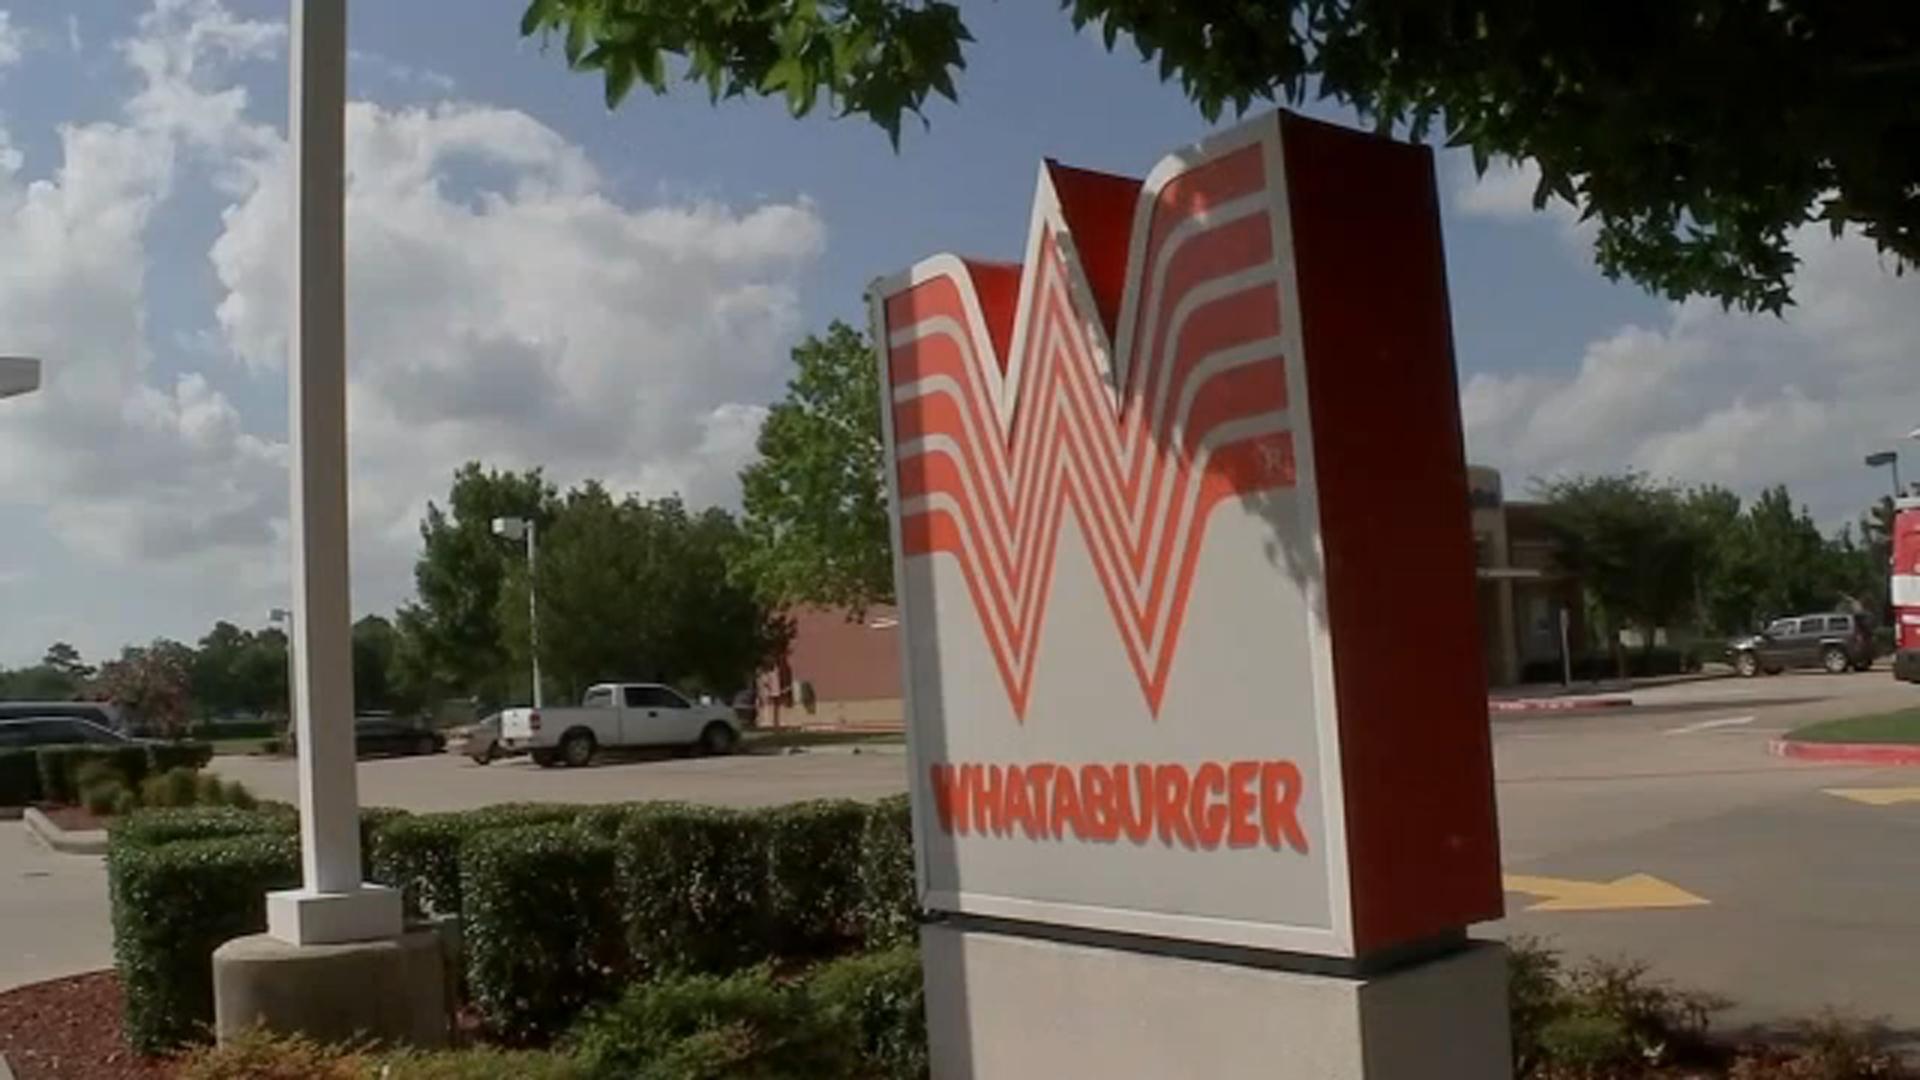 T-shirt calls Whataburger 'Chicago's Most Famous Texas